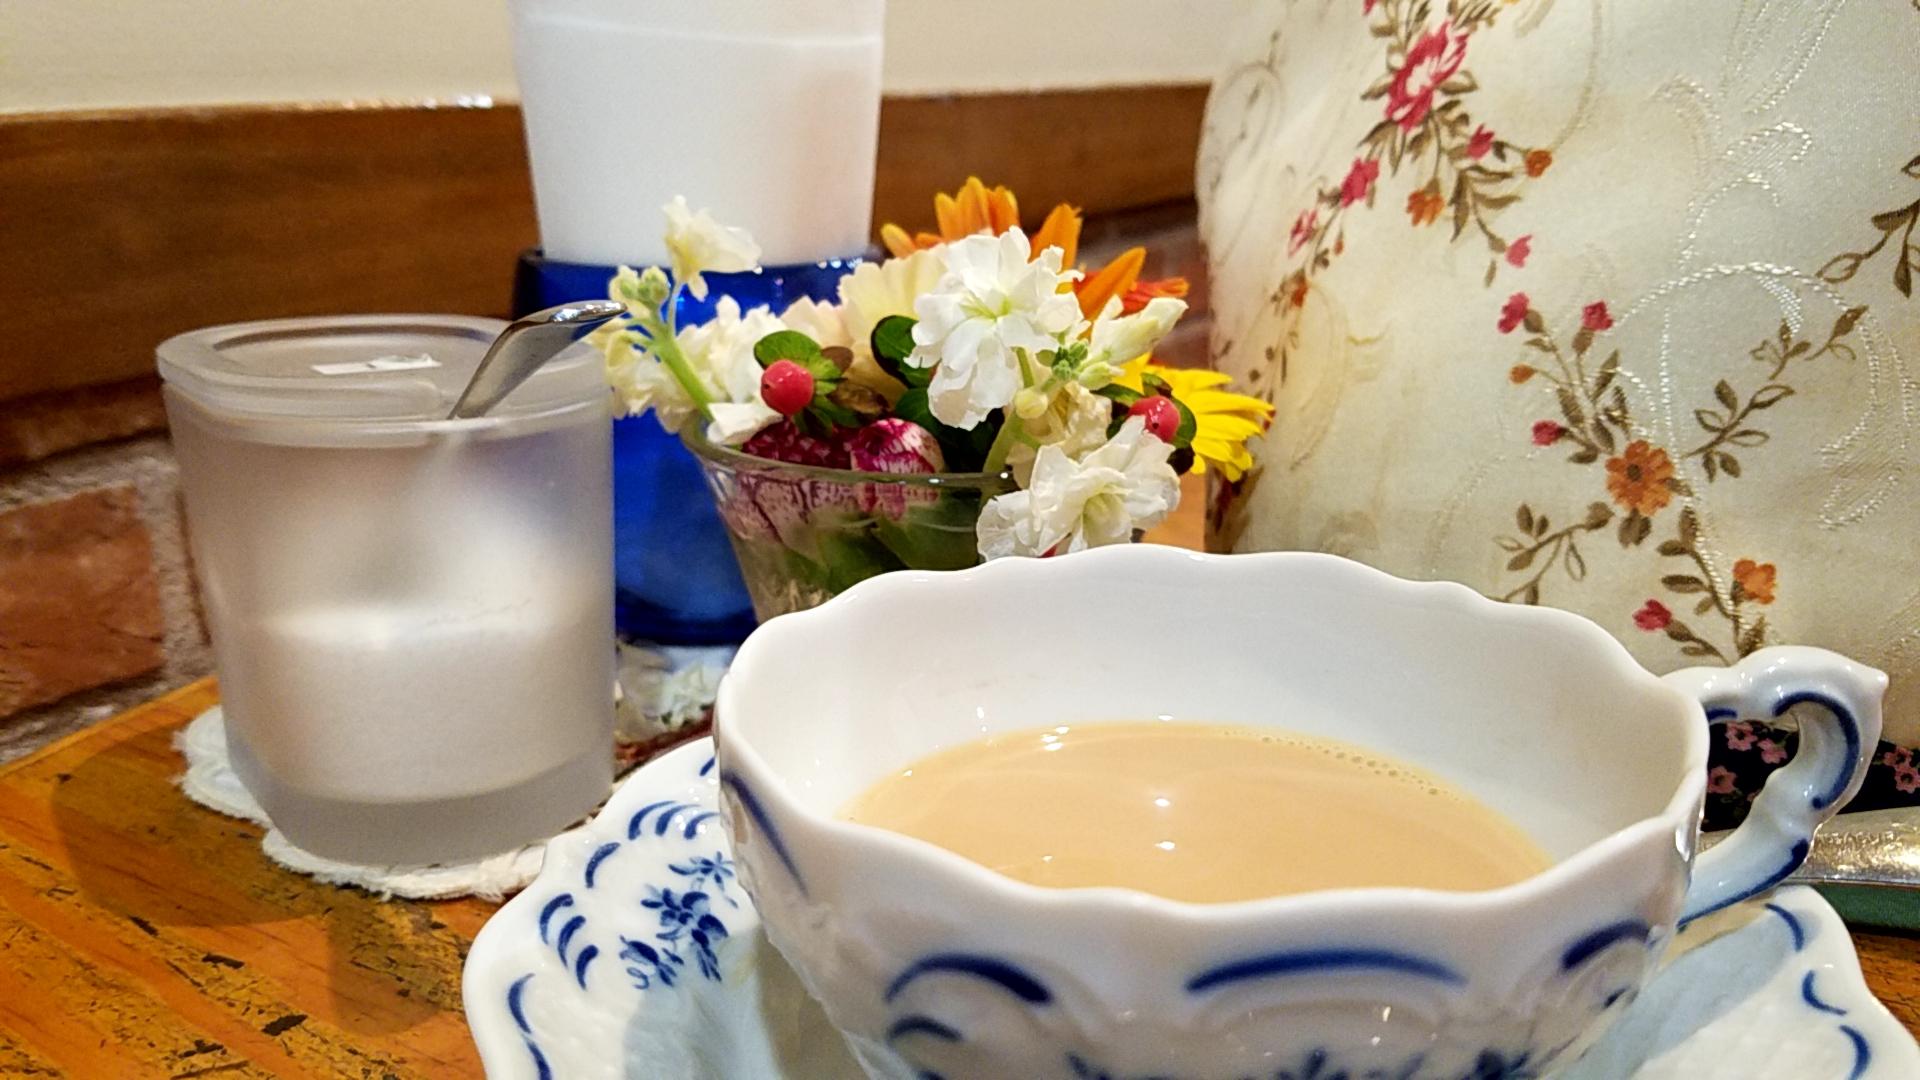 My tearoom